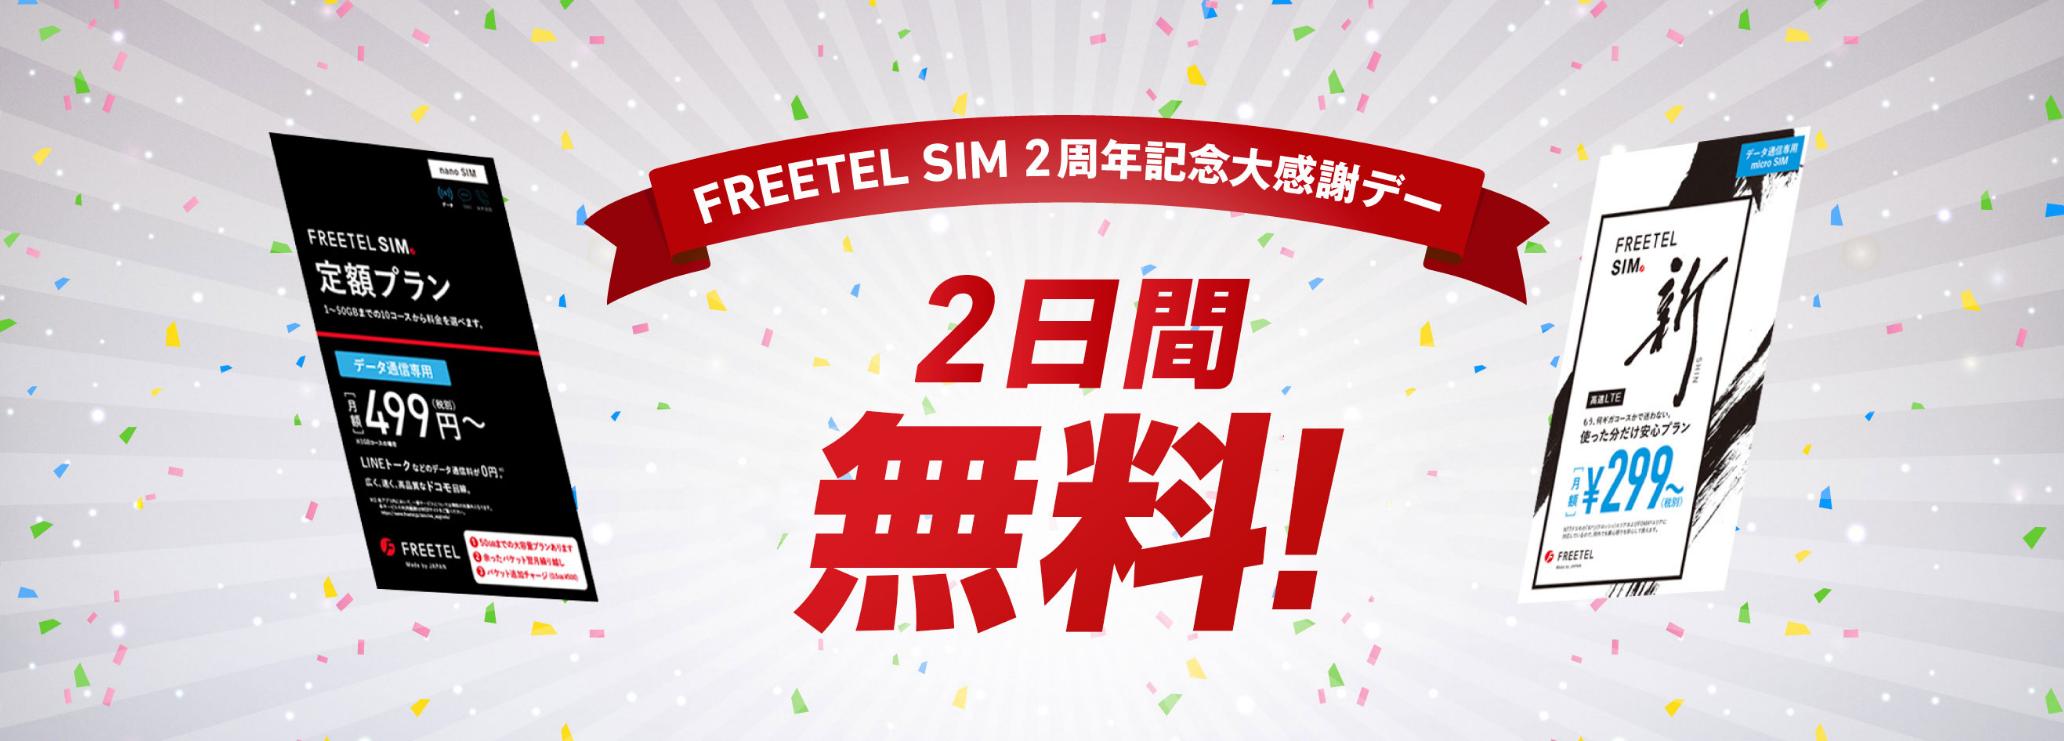 FREETEL SIM 2周年を記念して「2日間無料」キャンペーンを6月29日、30日に実施へ